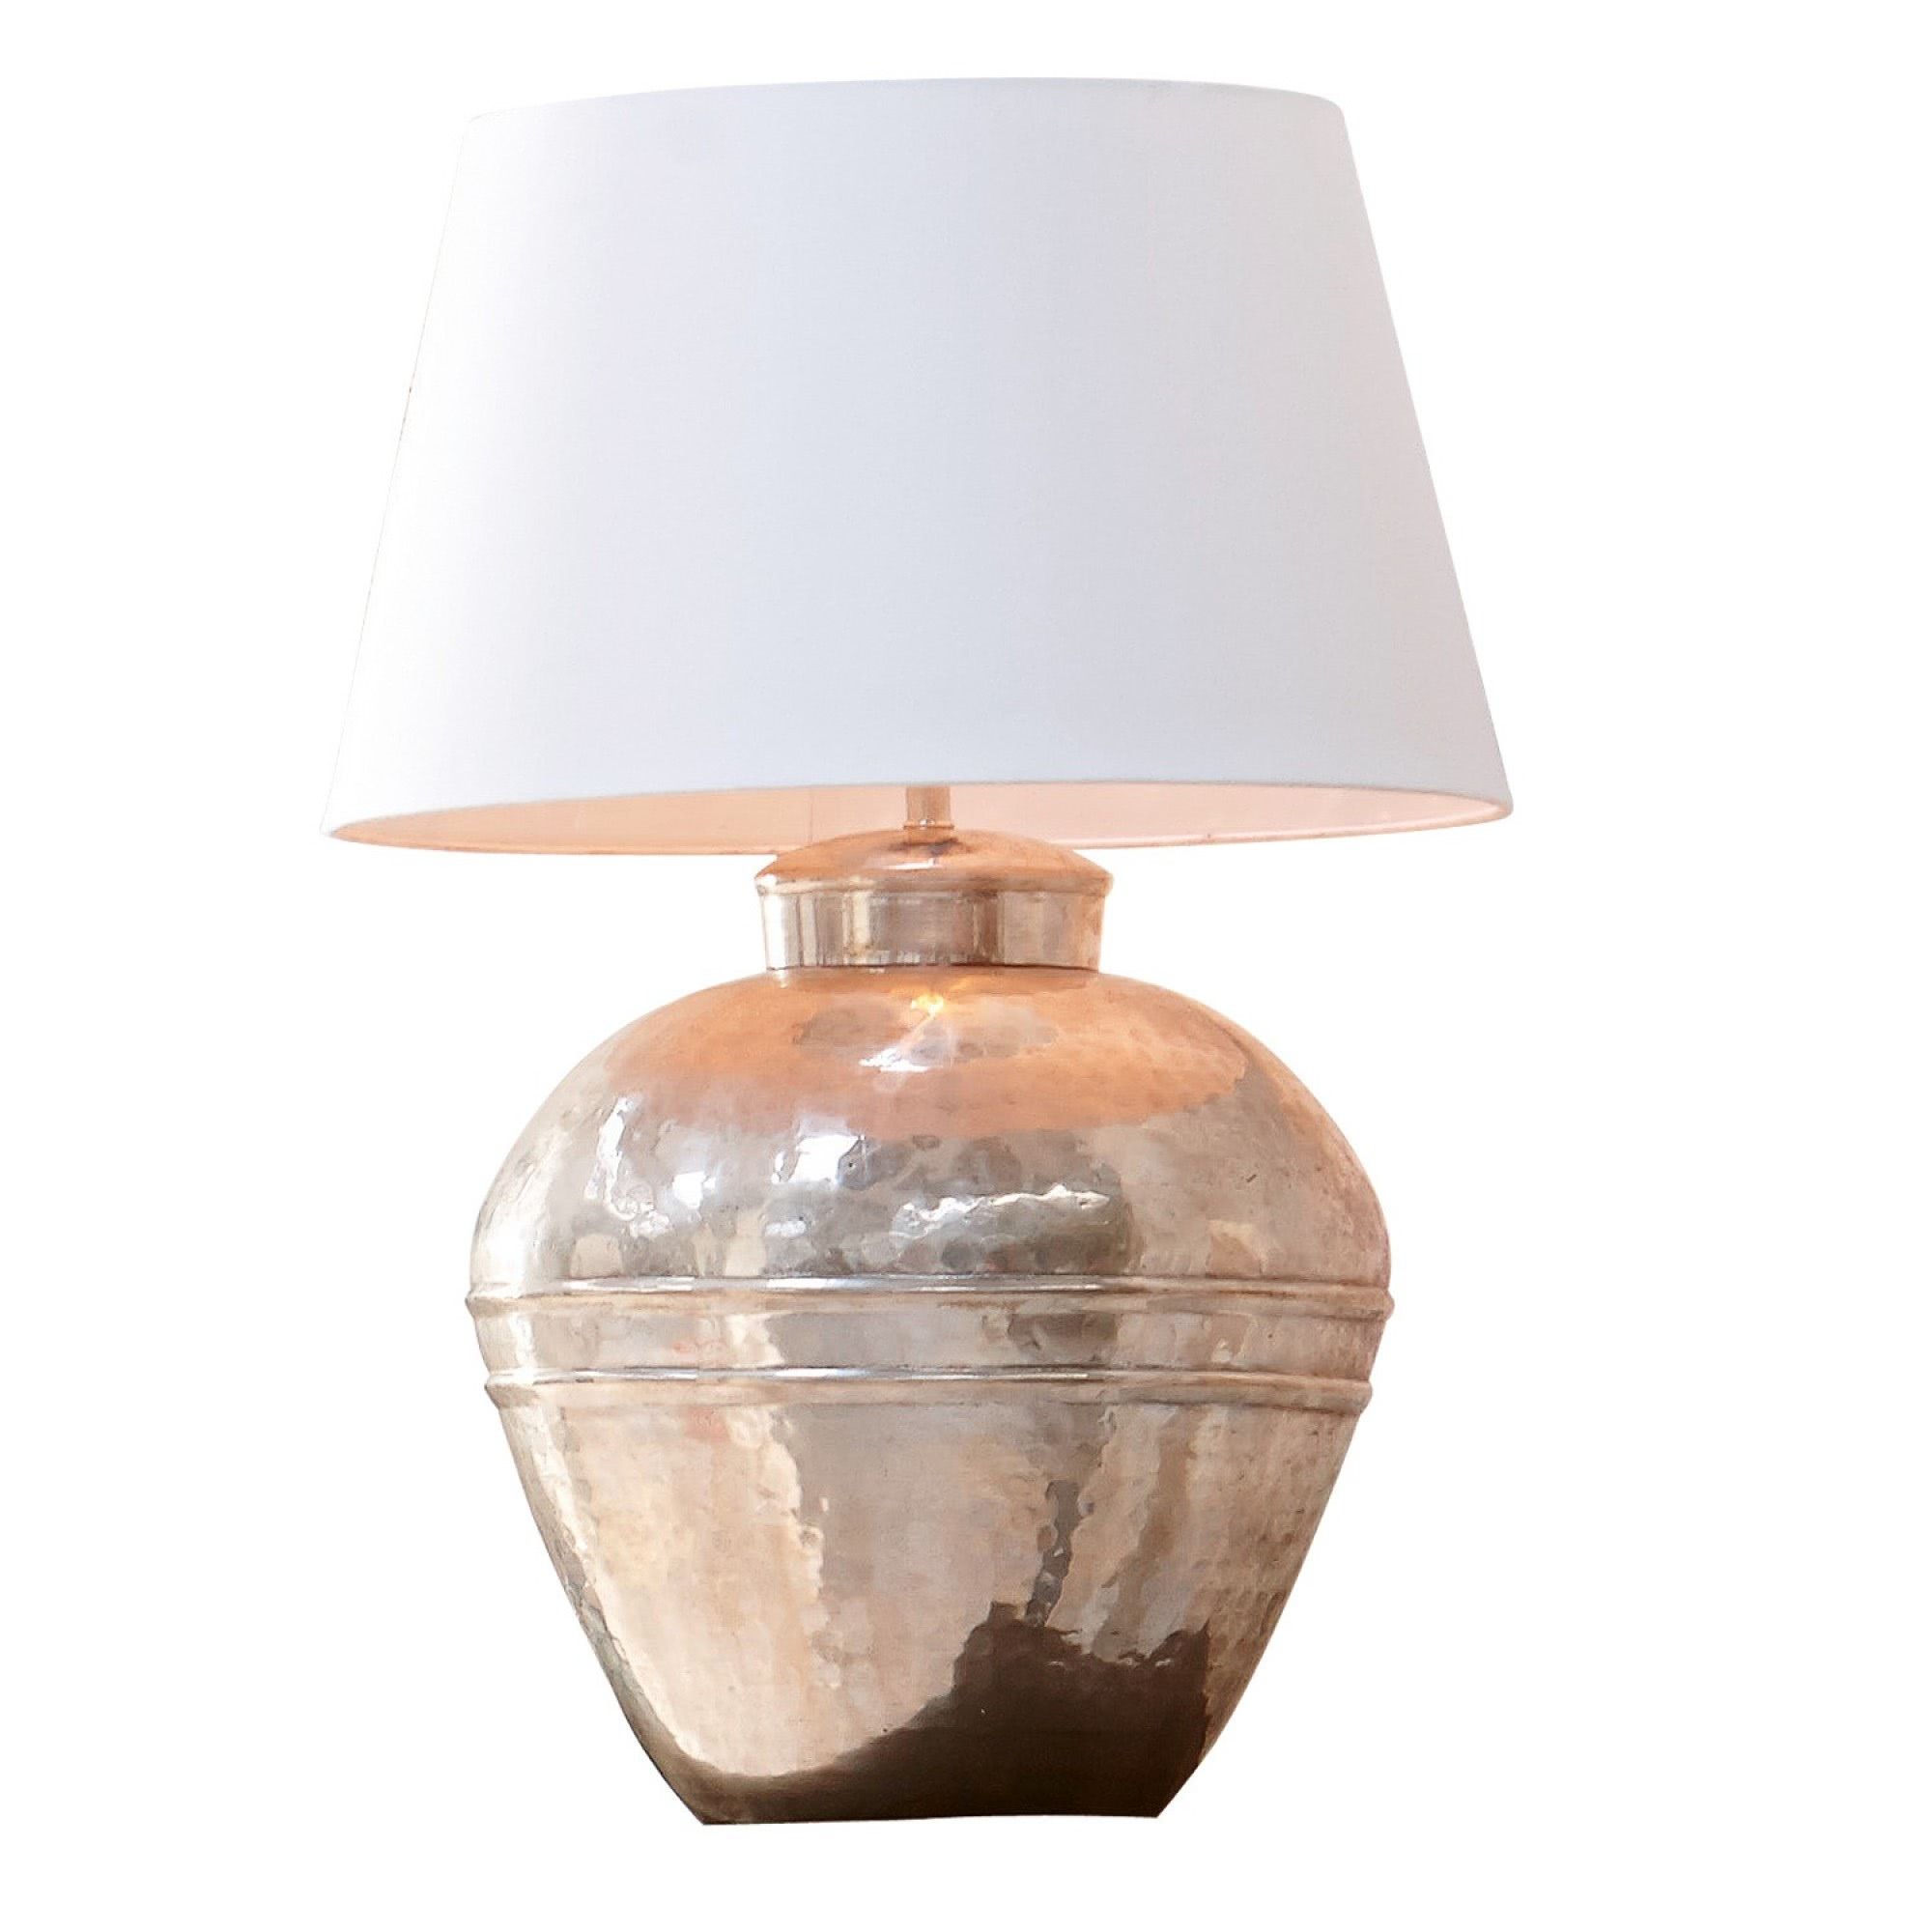 tischlampe madison loberon coming home. Black Bedroom Furniture Sets. Home Design Ideas